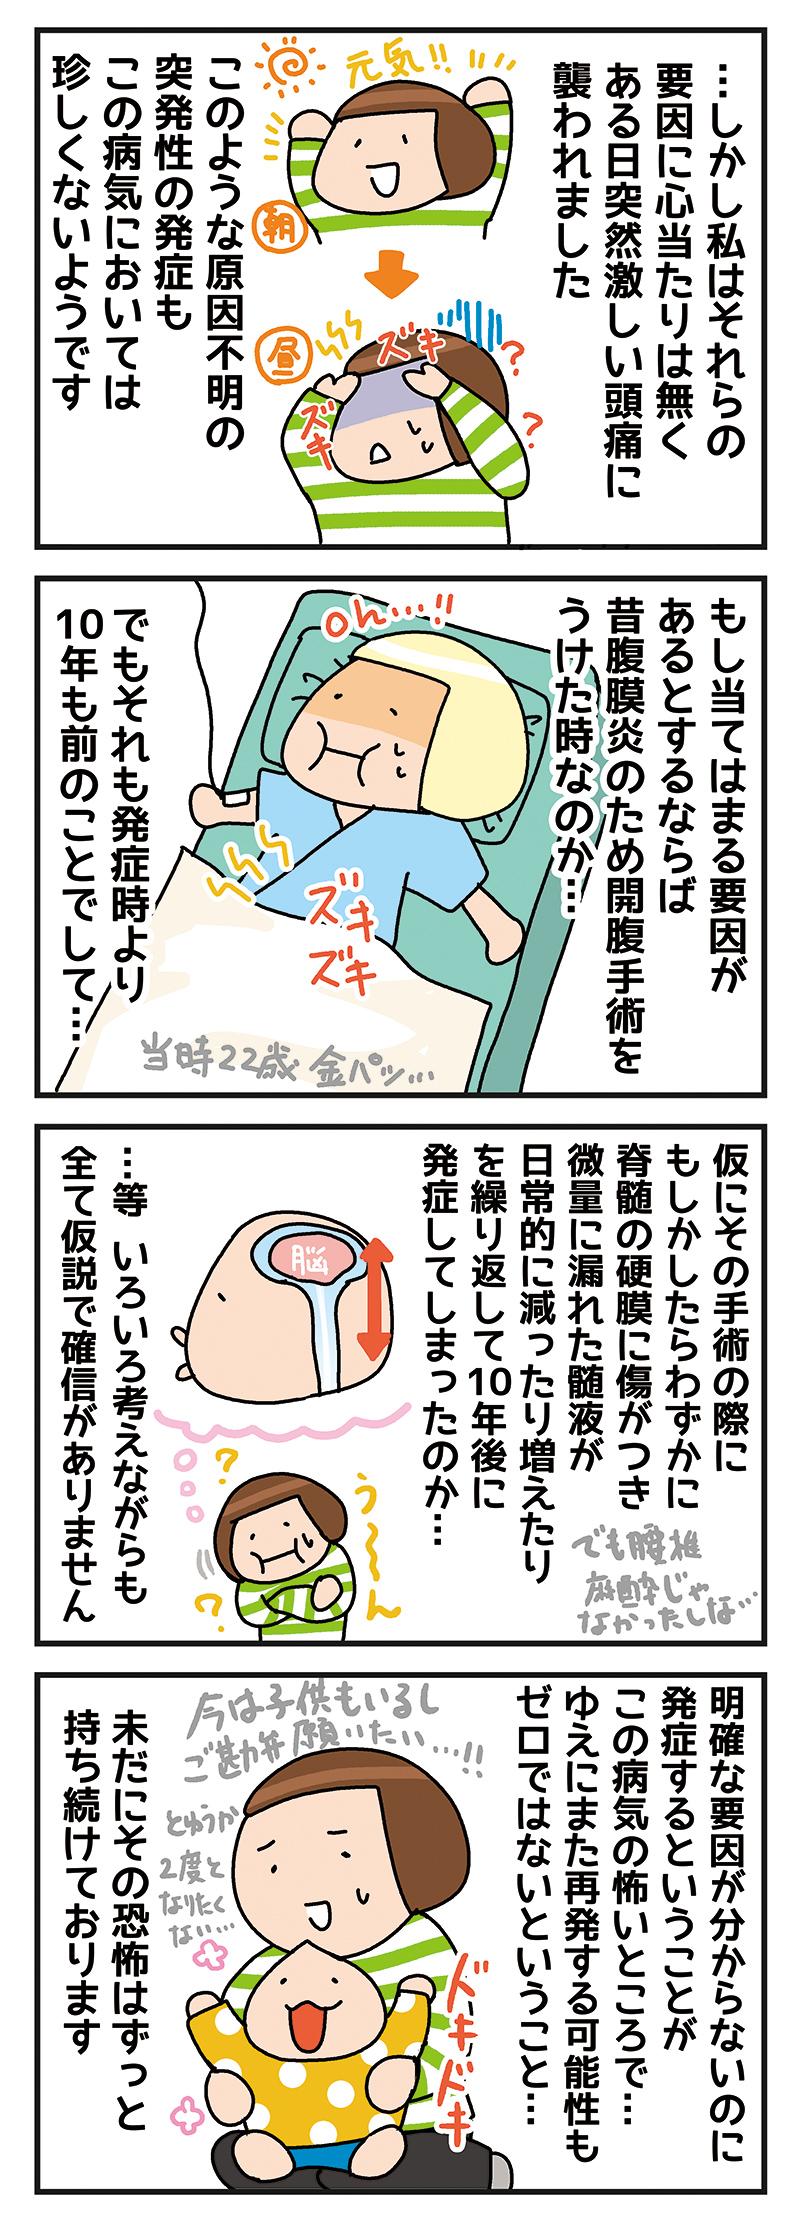 BP_200527_2